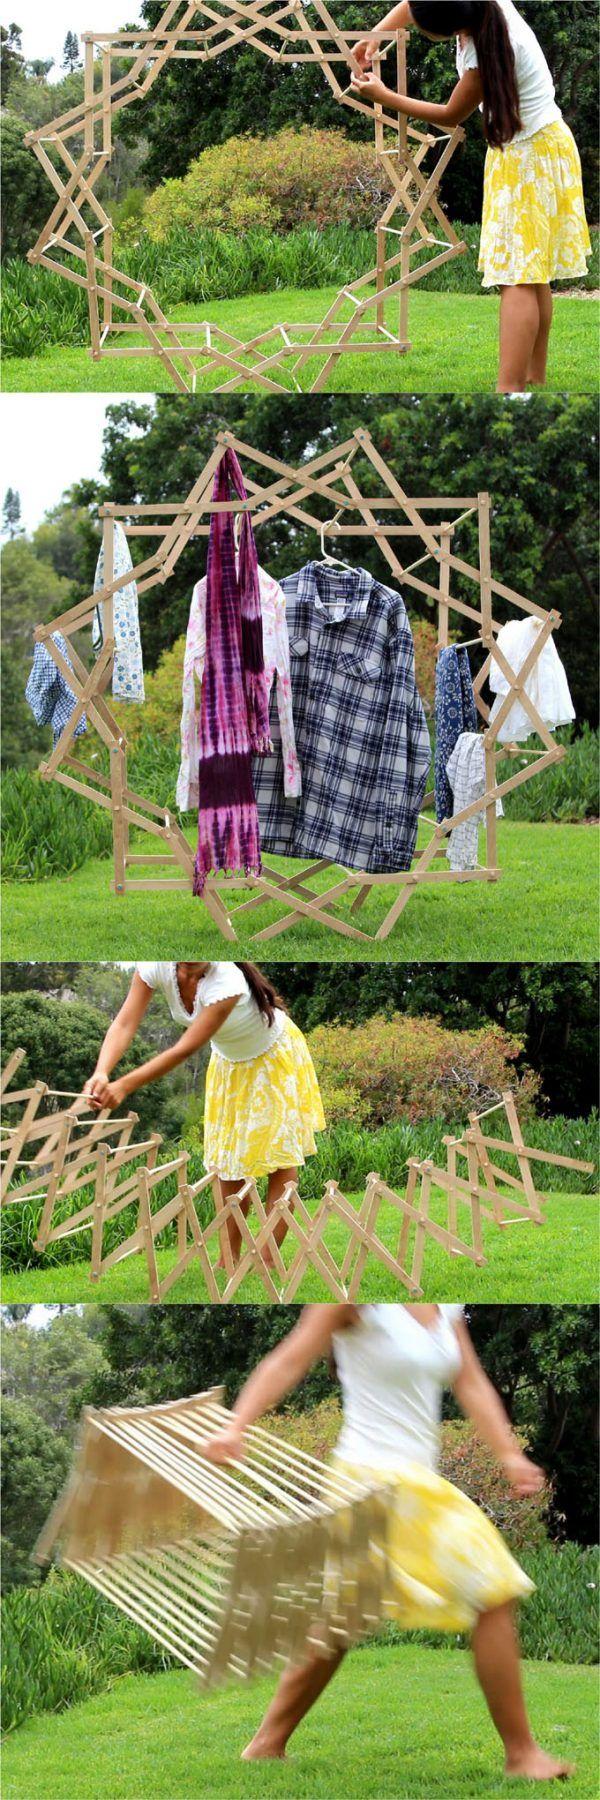 star-shaped-clothes-drying-rack-apieceofrainbowblog (1)